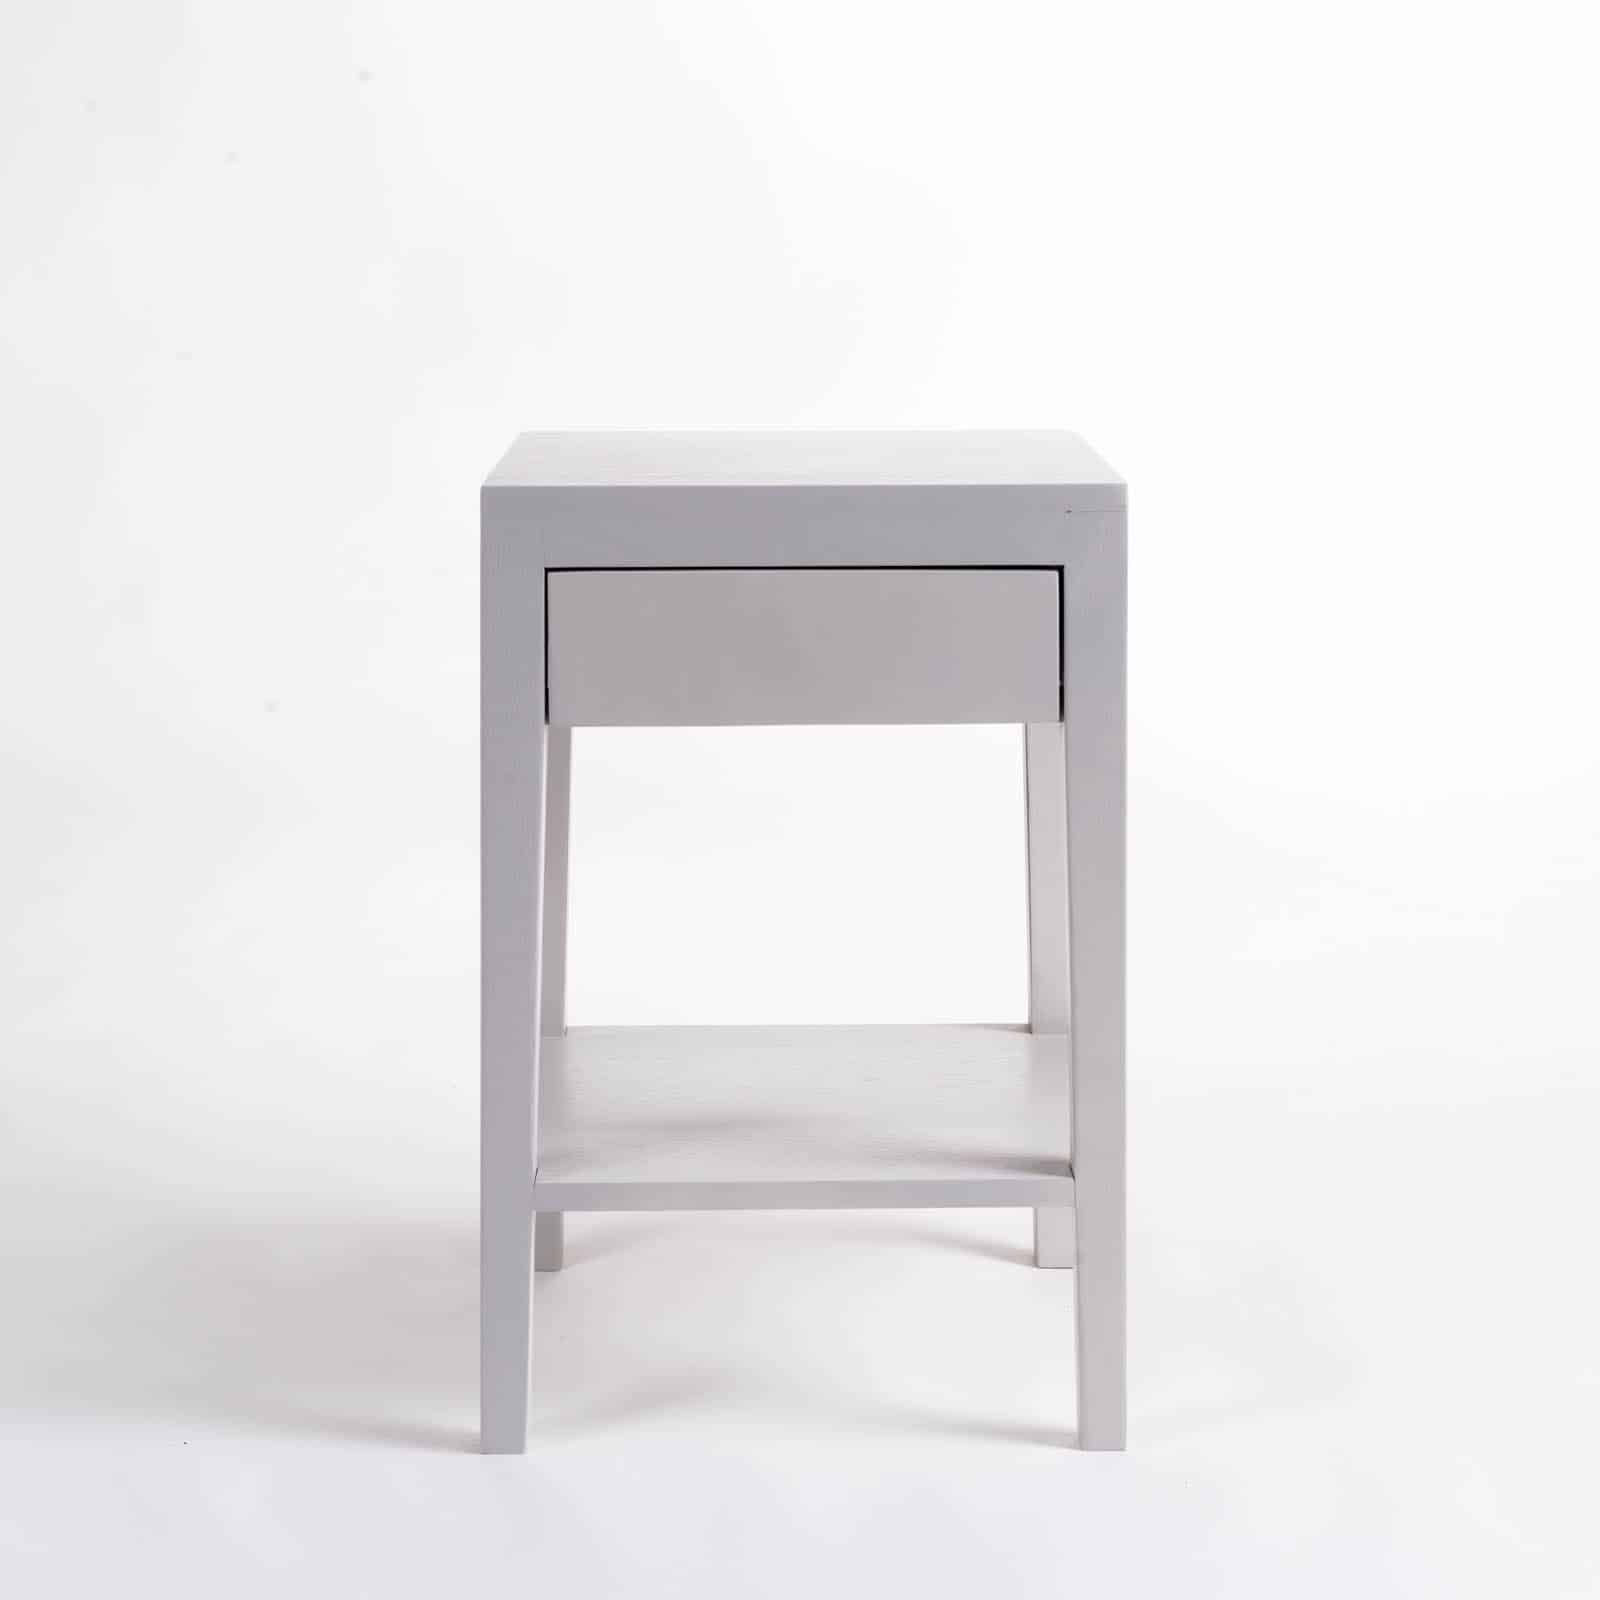 cheriton bedside 1 drawer grey di designs. Black Bedroom Furniture Sets. Home Design Ideas